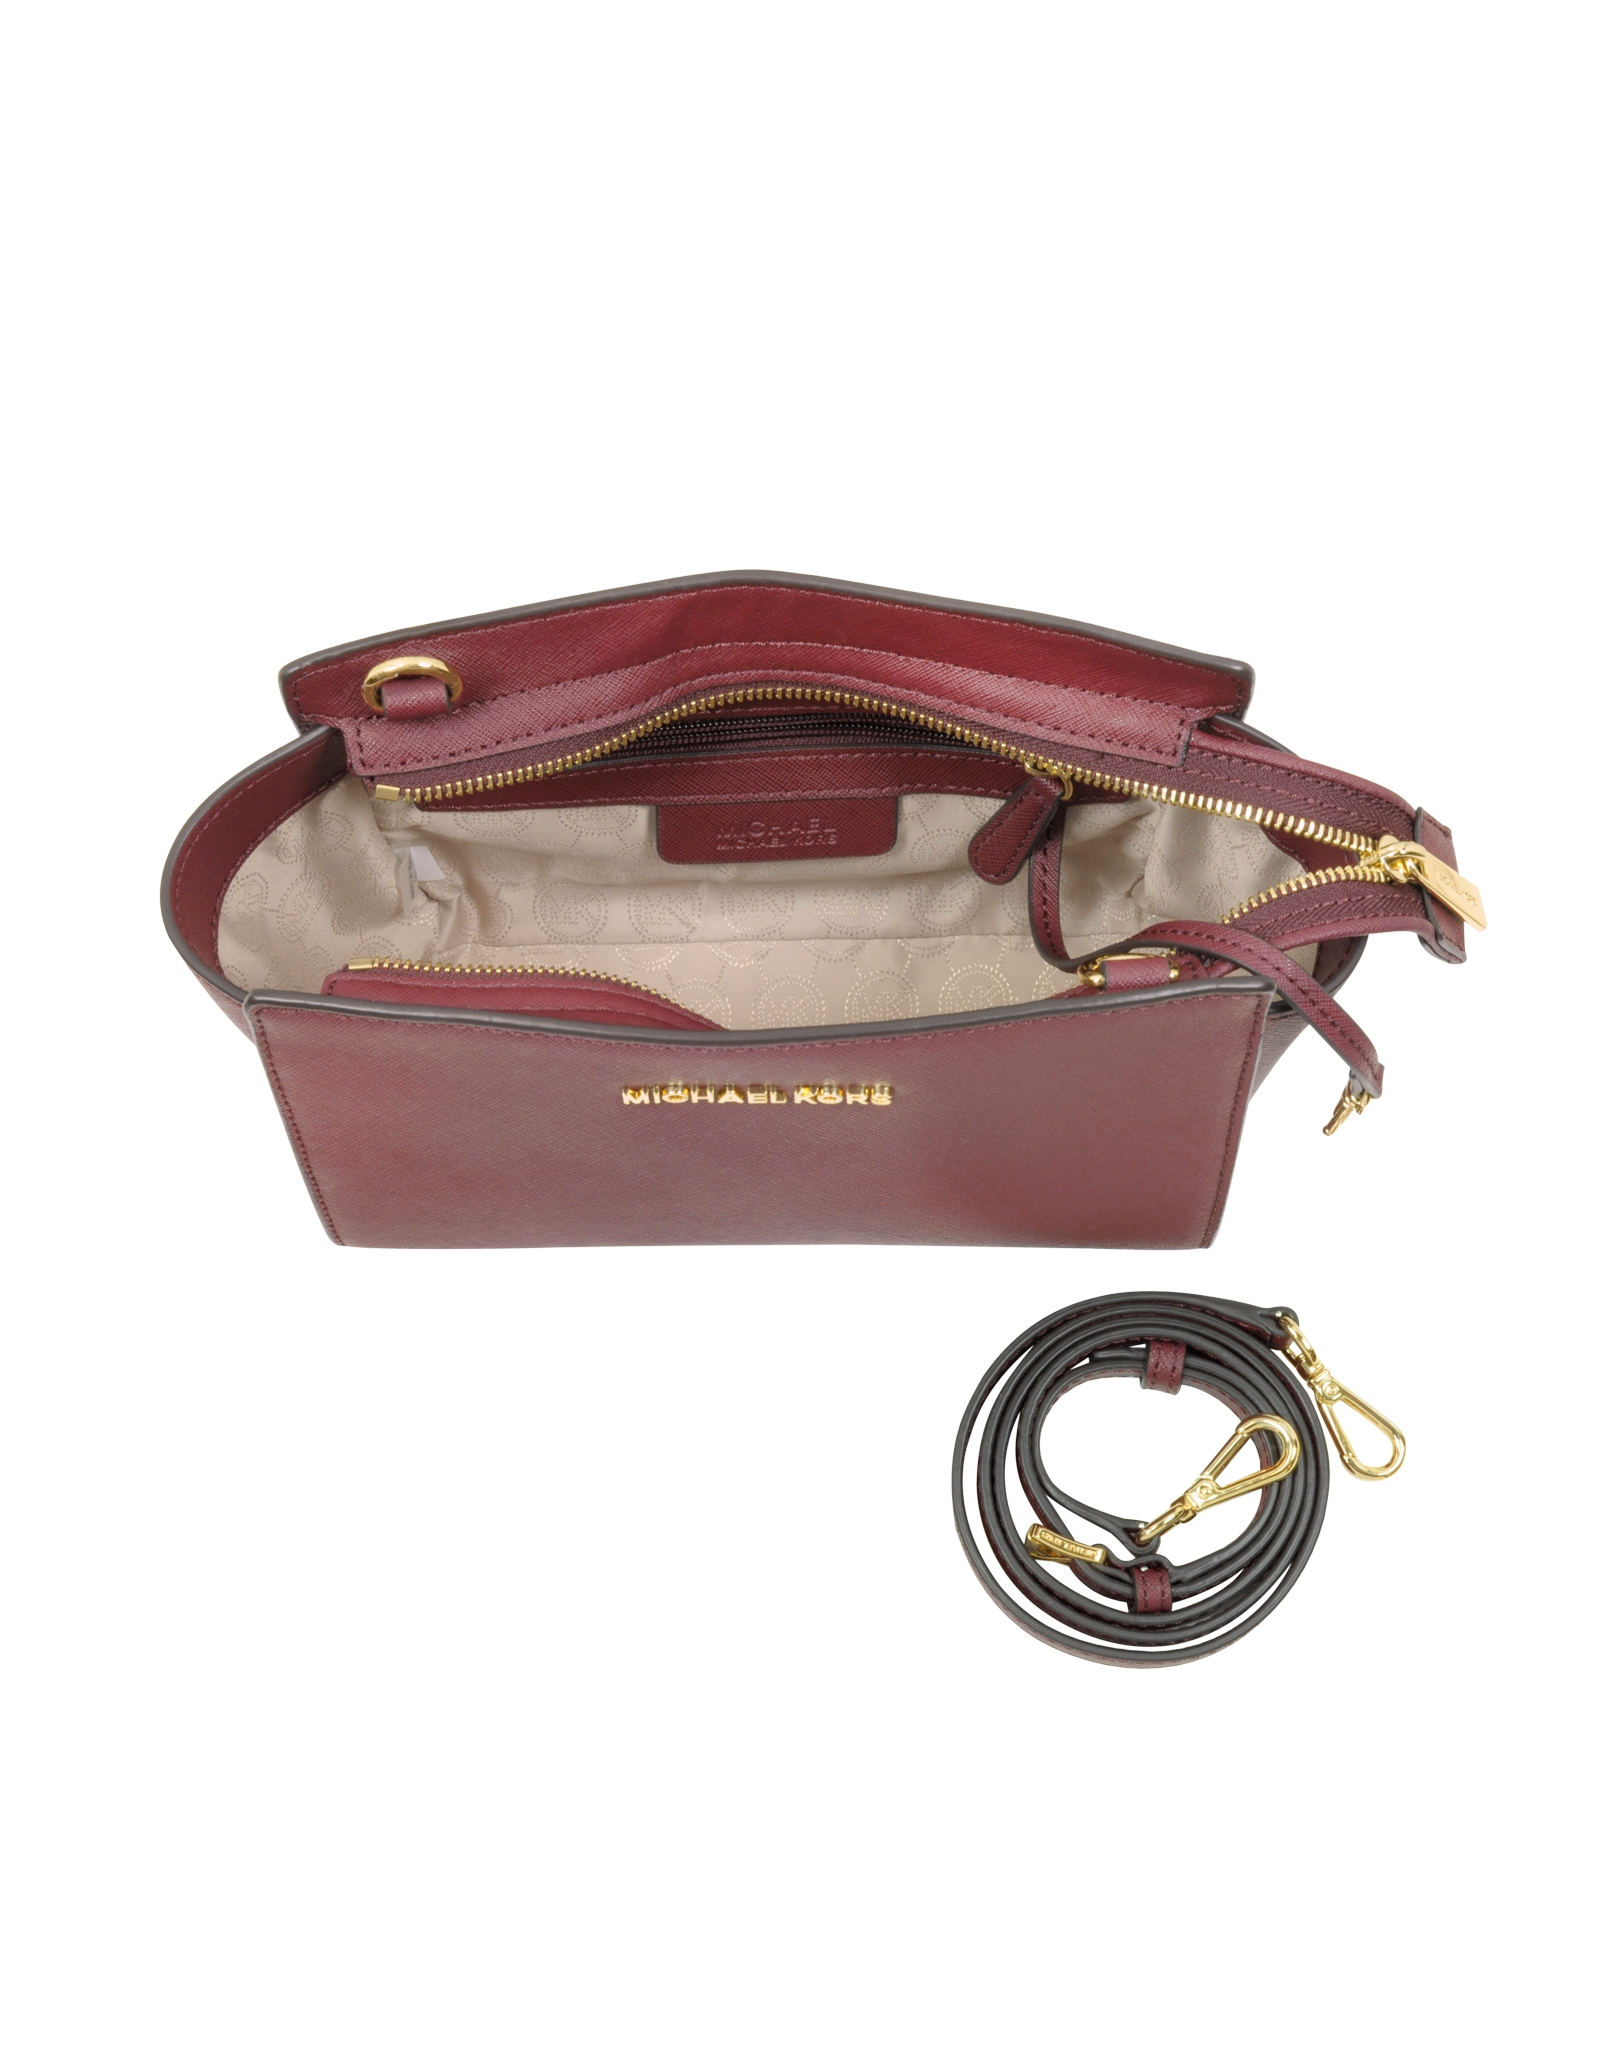 c5926f11df55 Michael Kors Selma Saffiano Leather Medium Messenger Bag in Purple ...